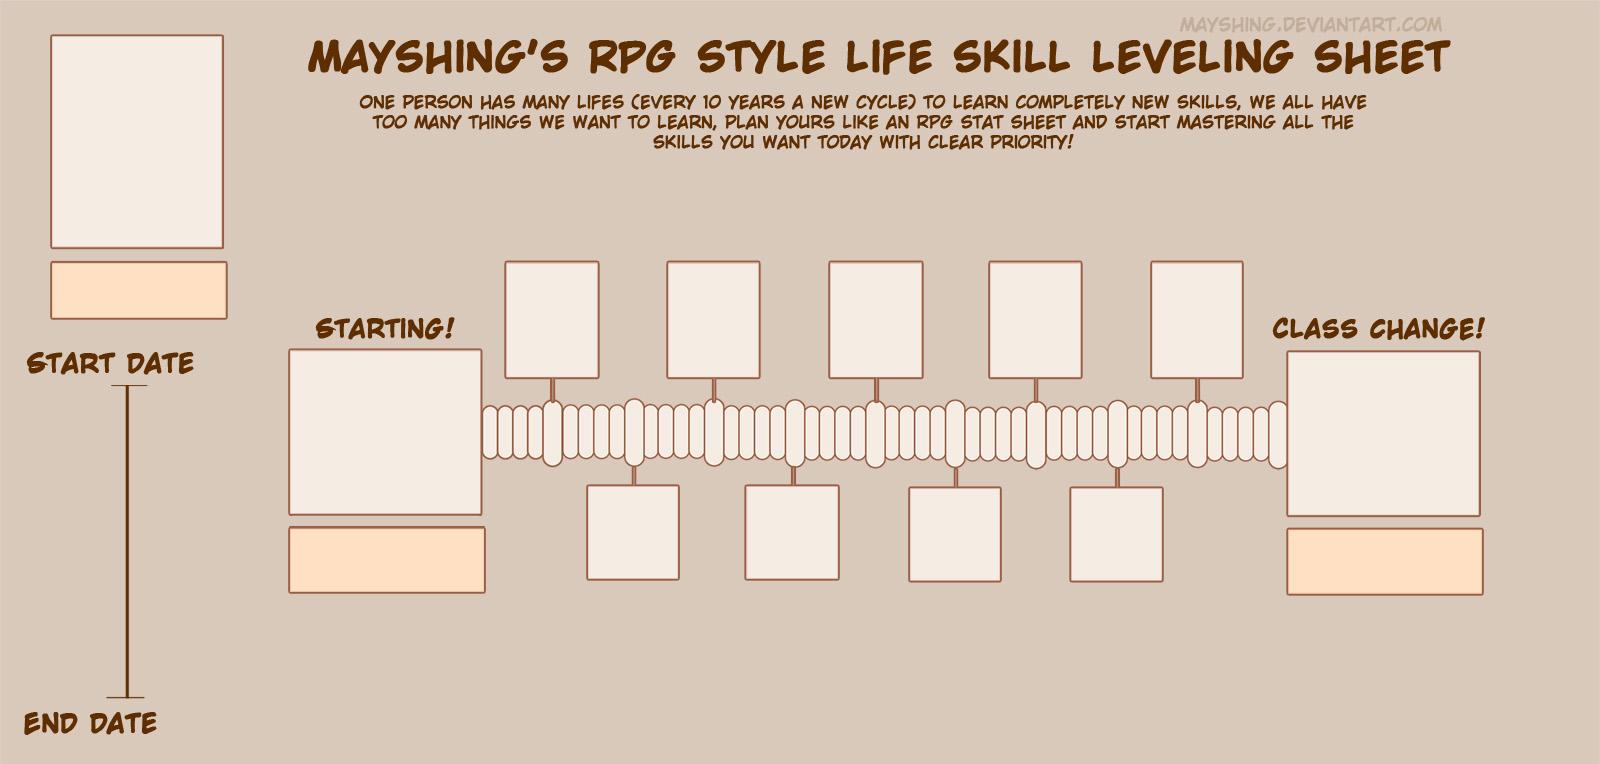 Skill level up chart meme - blank by mayshing